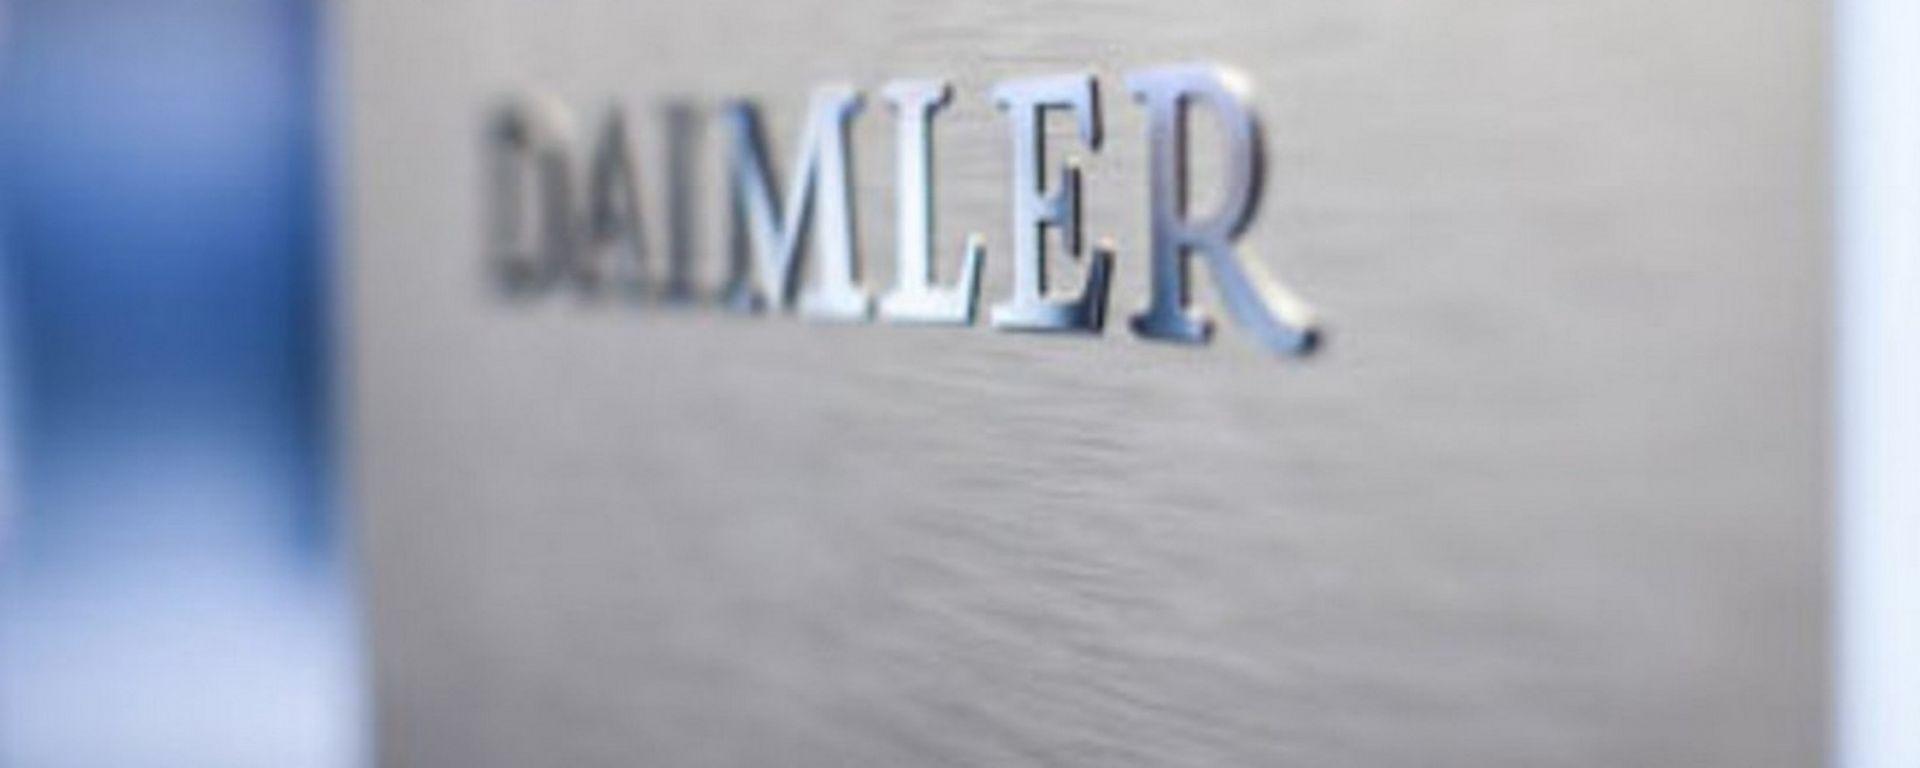 Daimler, un futuro in lingua cinese?